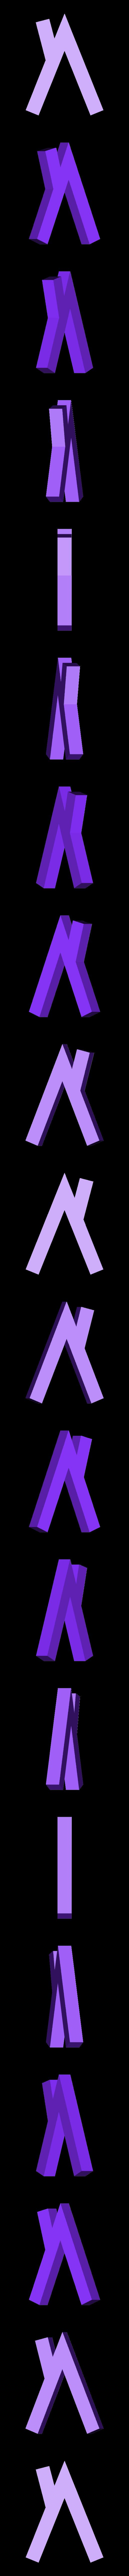 WakandaFont-T.stl Download free STL file Wakandan Font • Model to 3D print, hterefenko